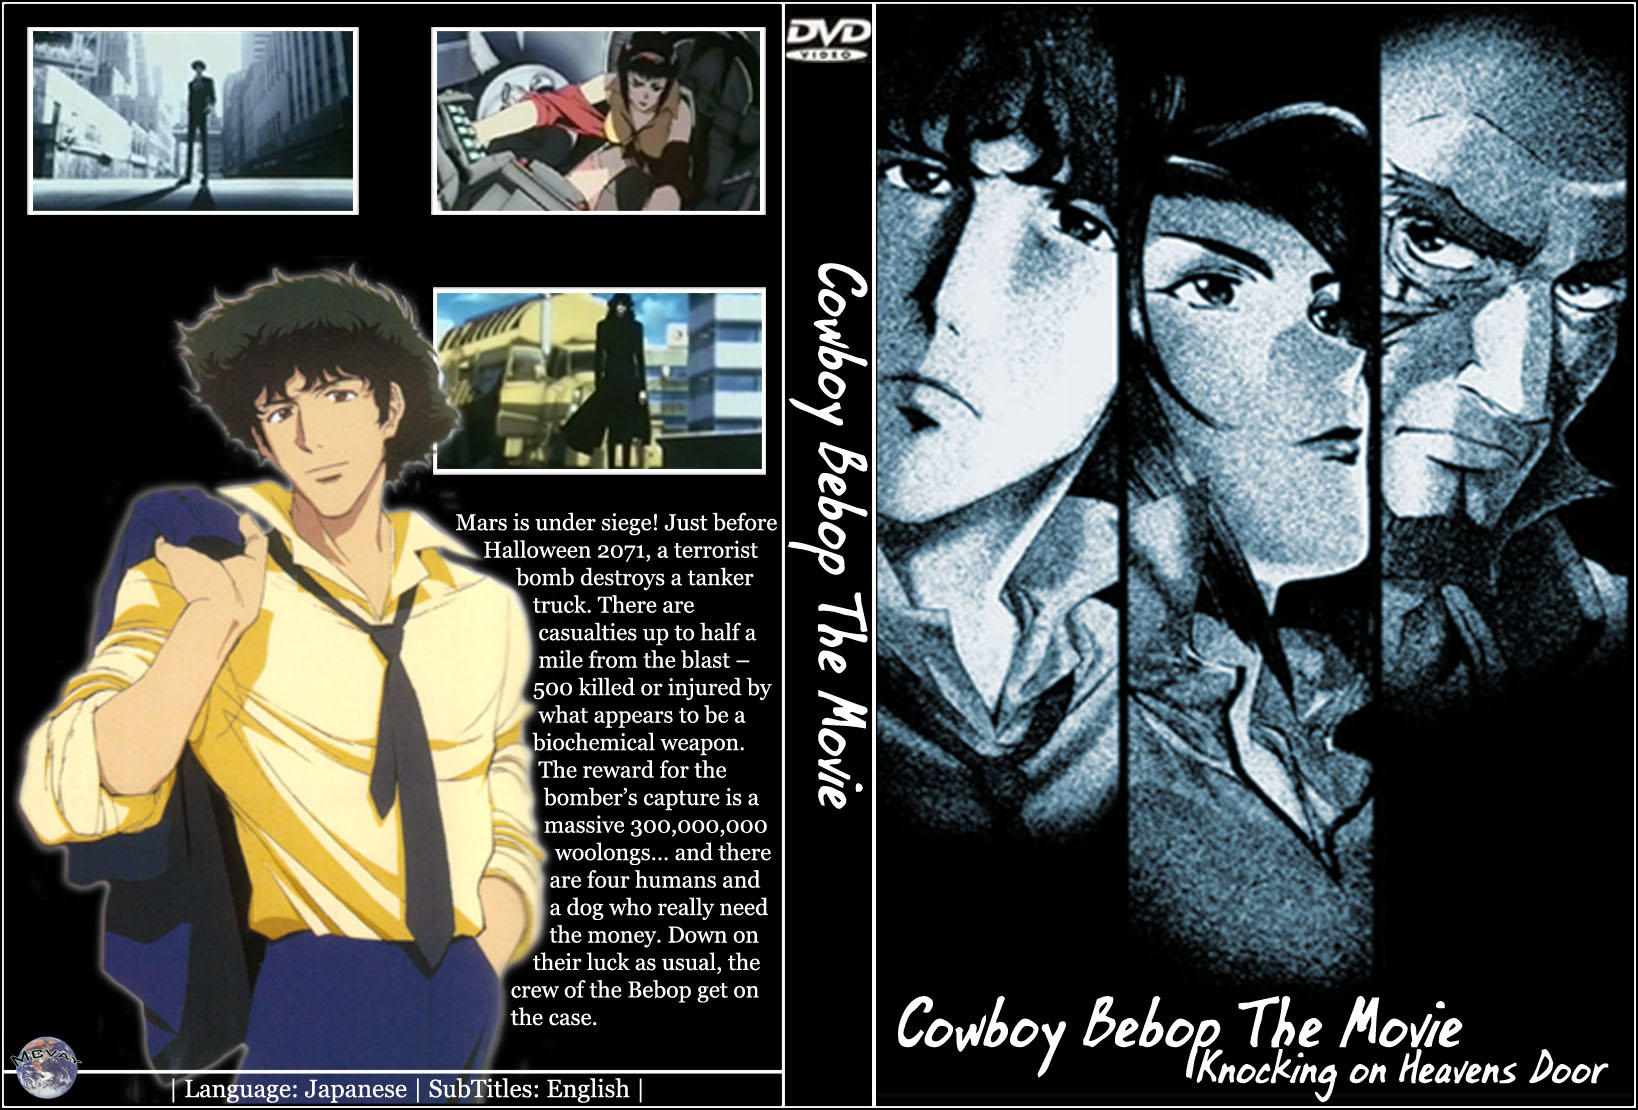 Cowboy Bebop The Movie  Wikipedia